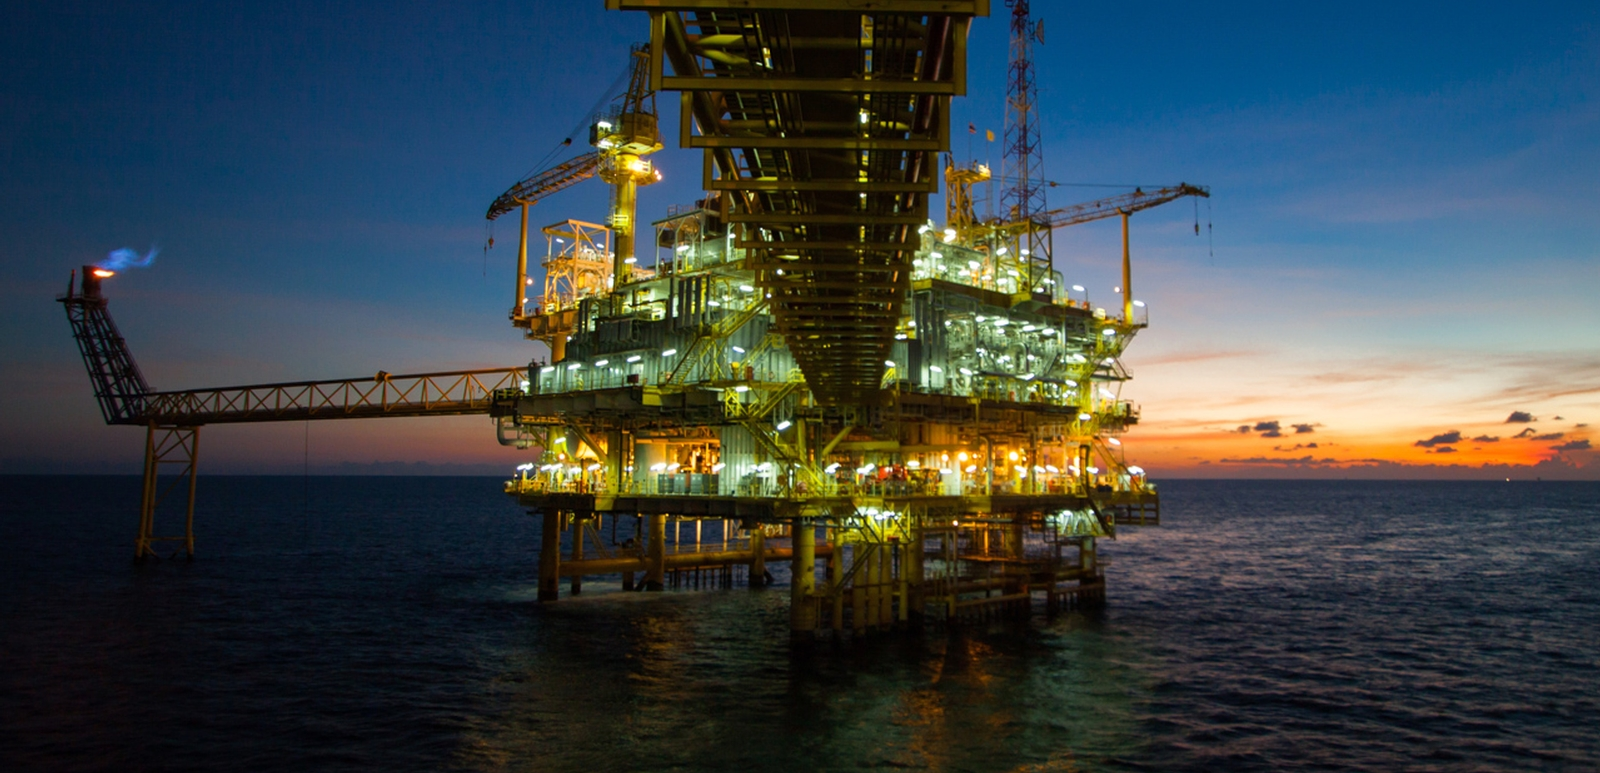 Oil Analysis Refinery